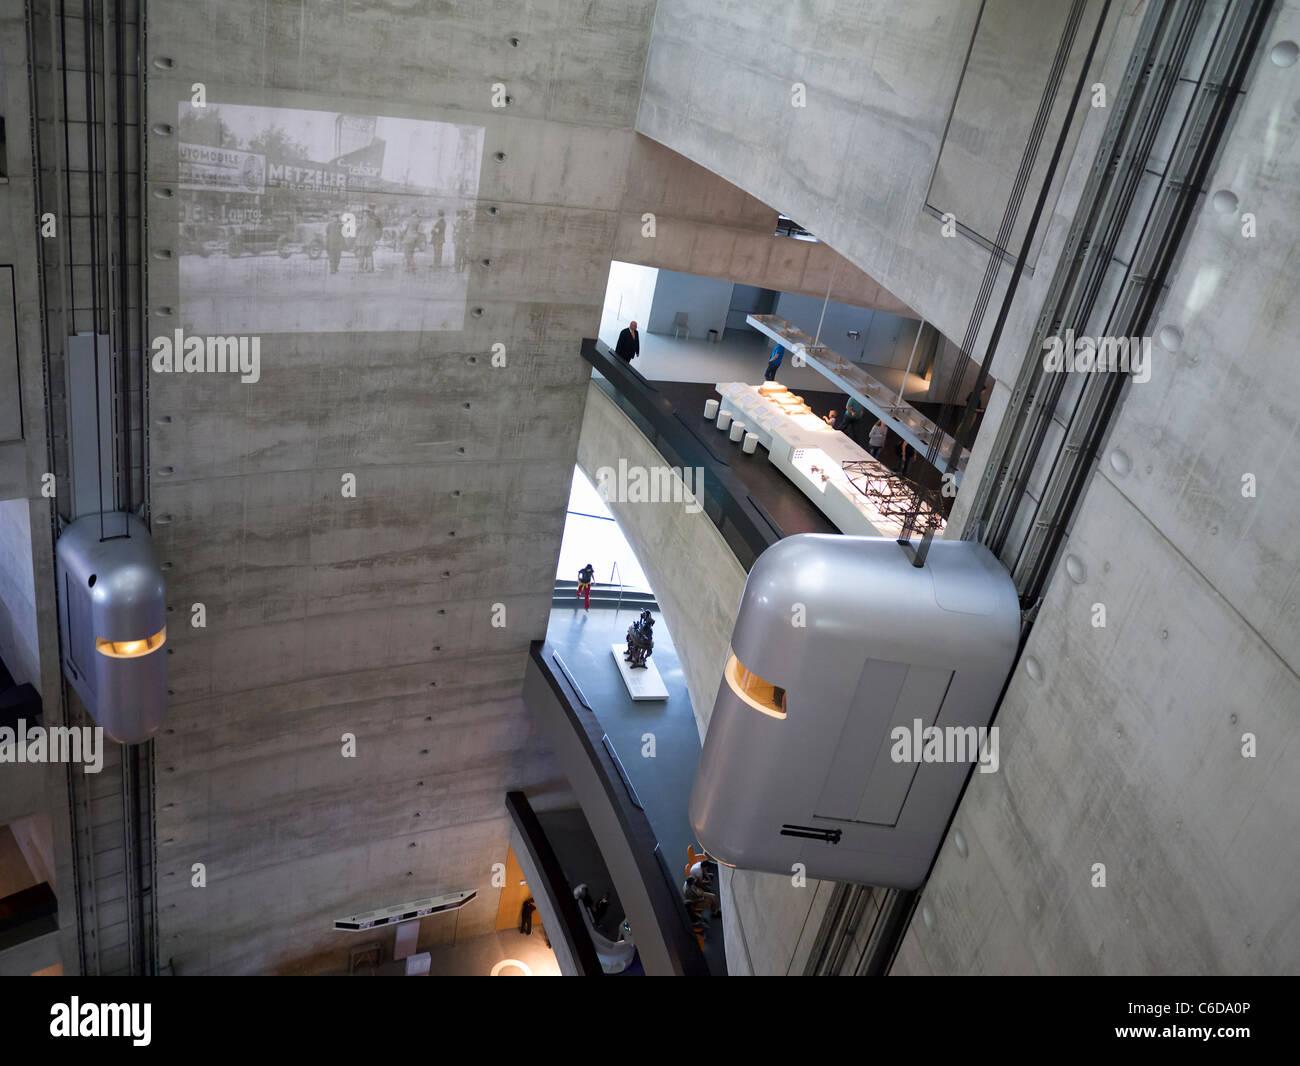 Atrium with elevators inside Mercedes Benz Museum in Stuttgart Germany - Stock Image